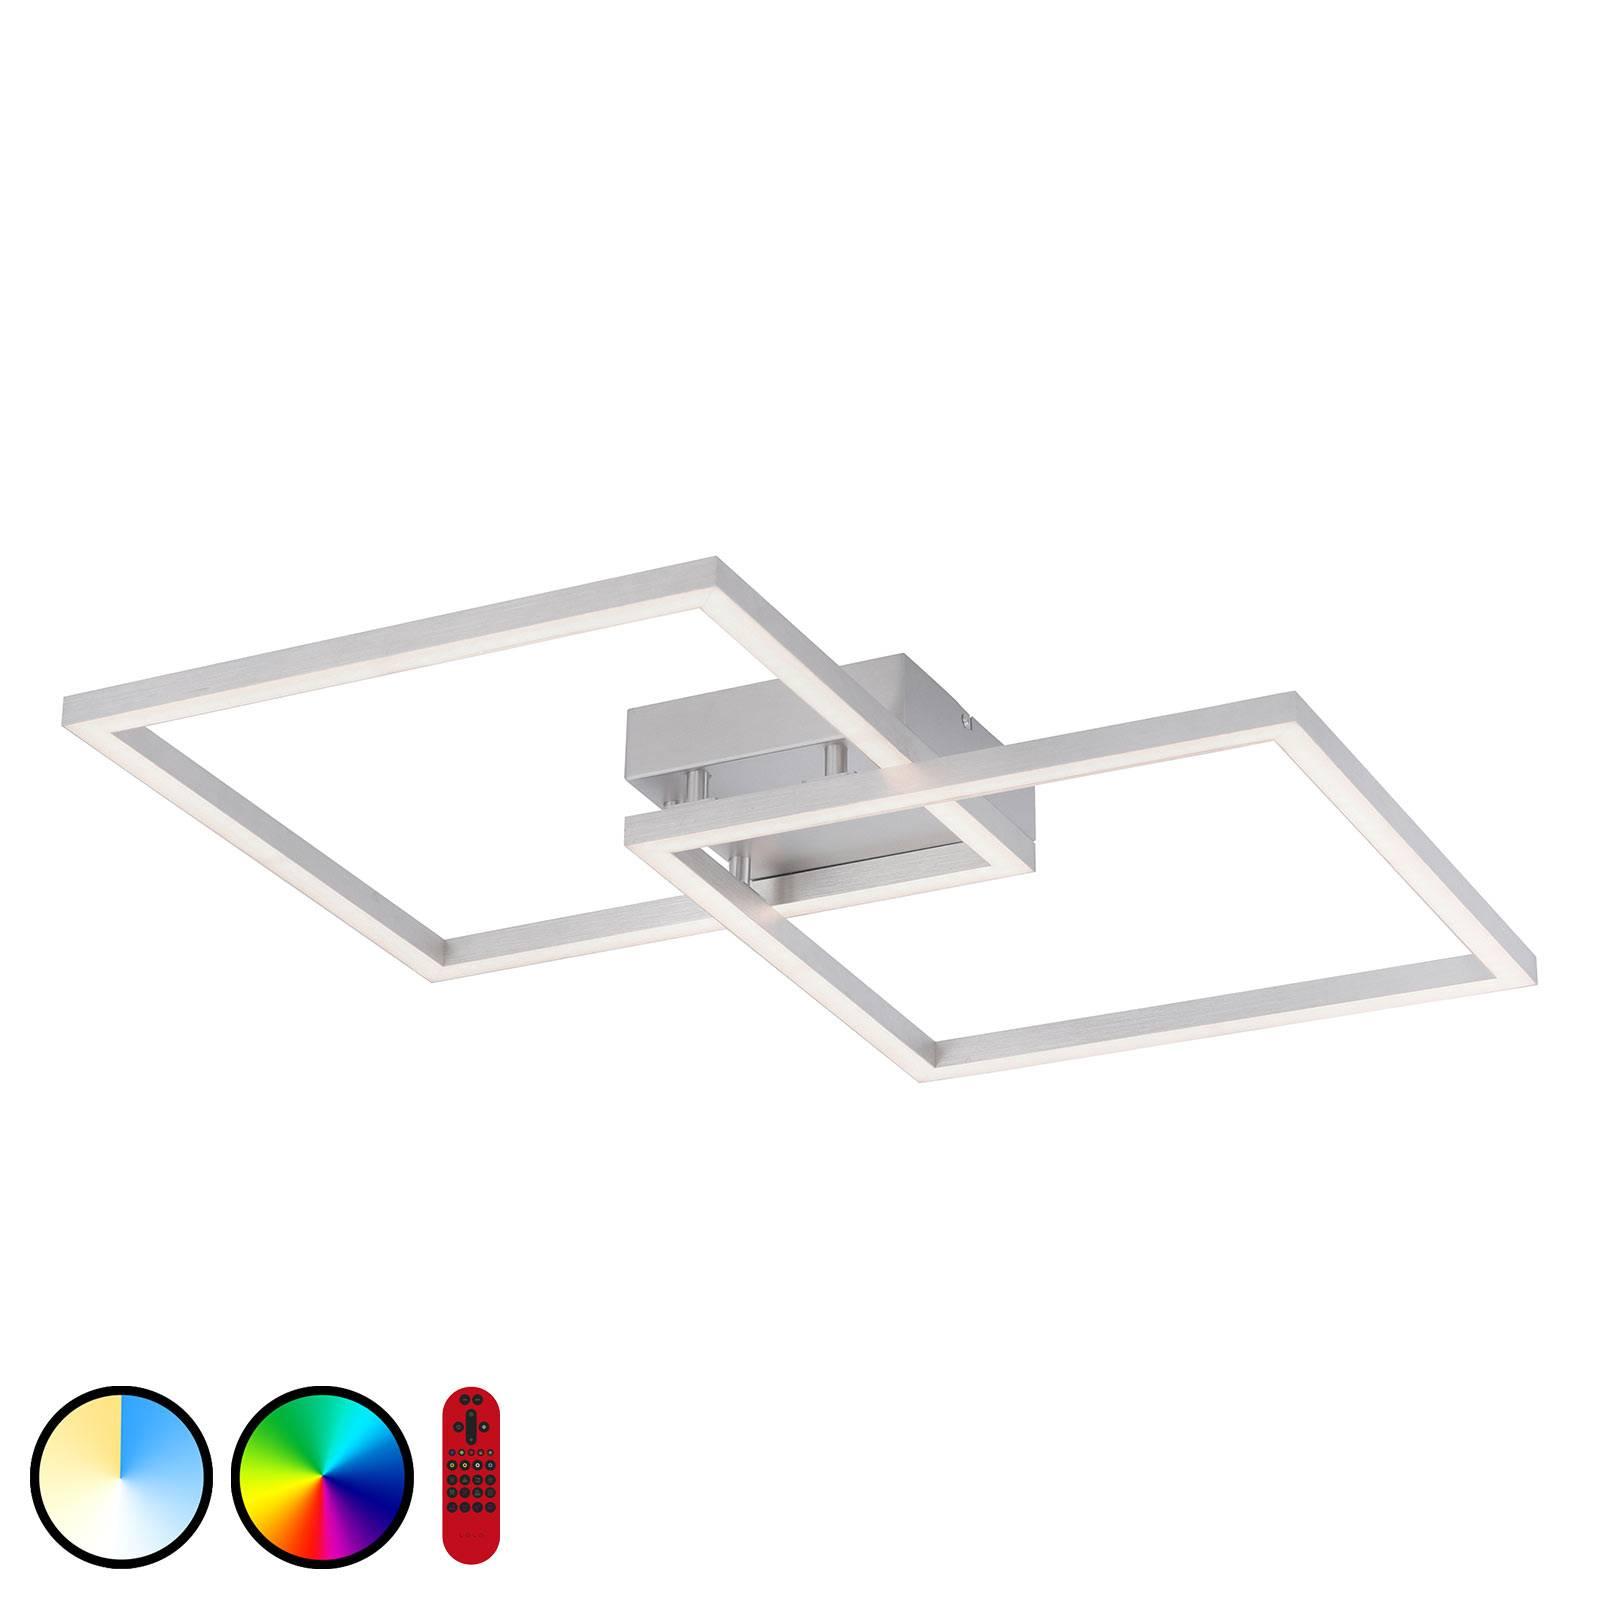 Lampa sufitowa LED LOLAsmart Maxi, 63 x 63 cm